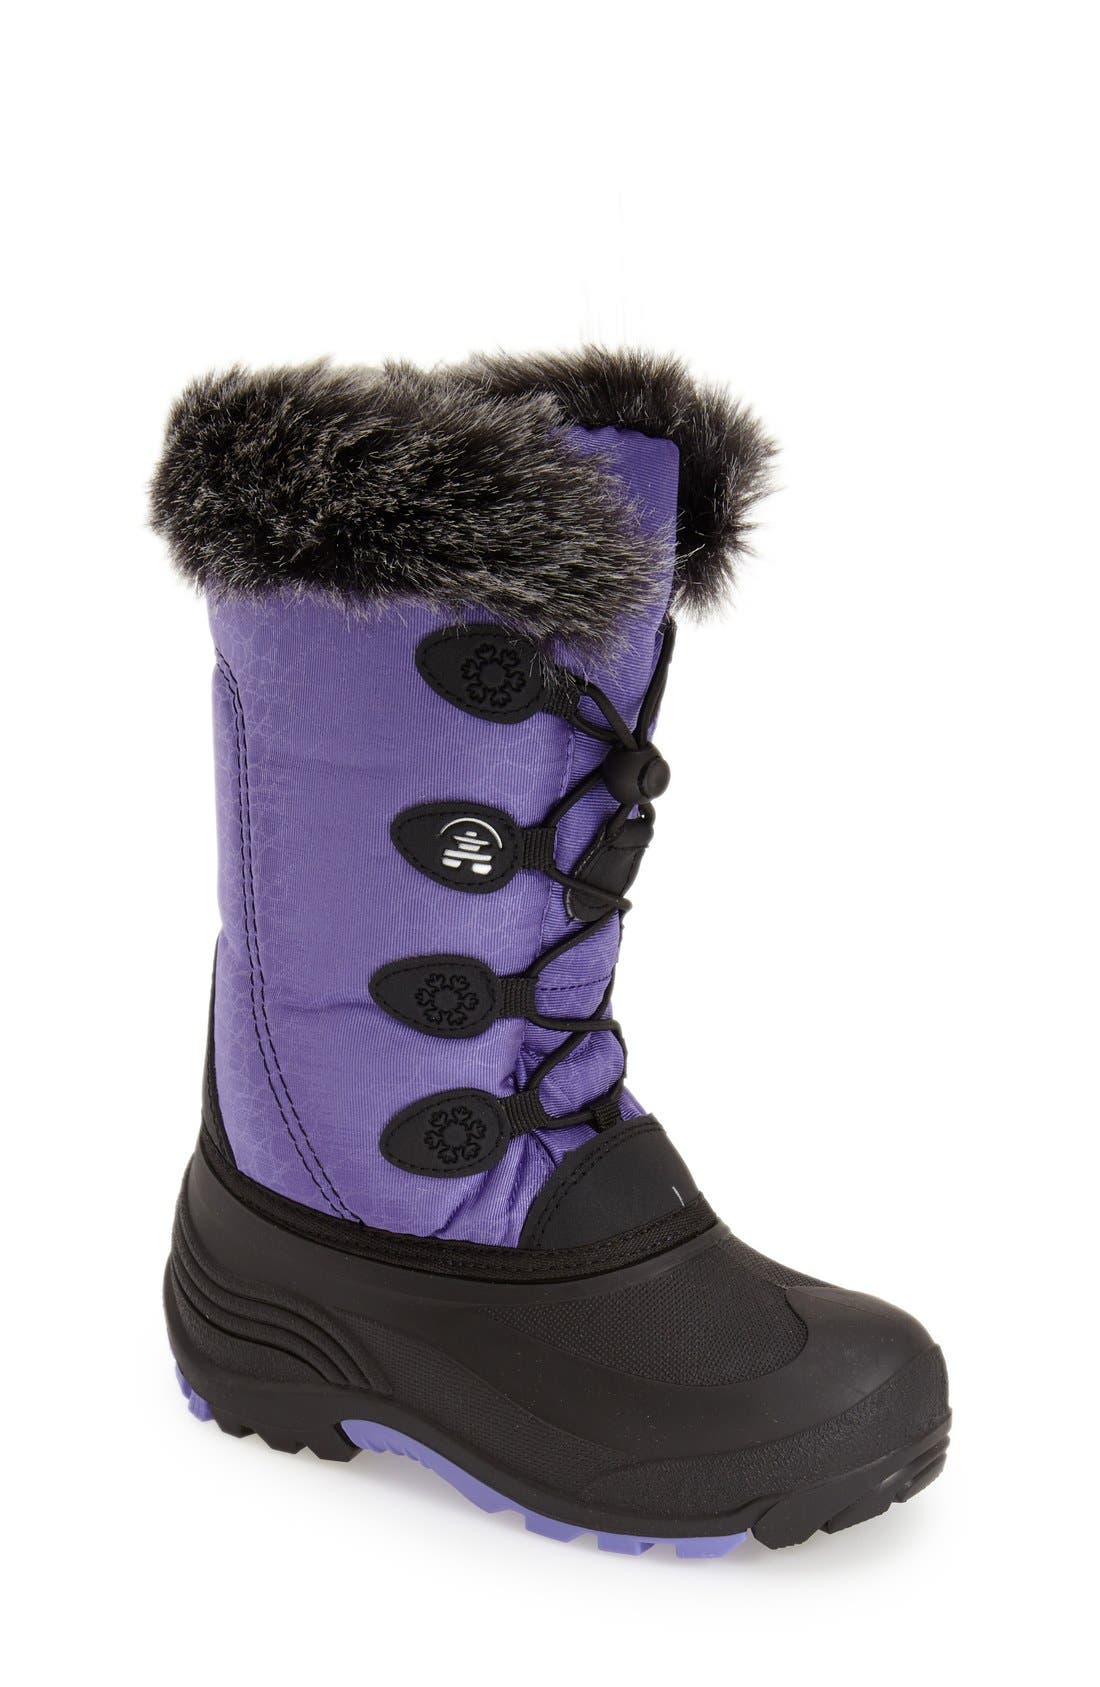 Kamik Kids Snowgypsy Waterproof Snow Boot